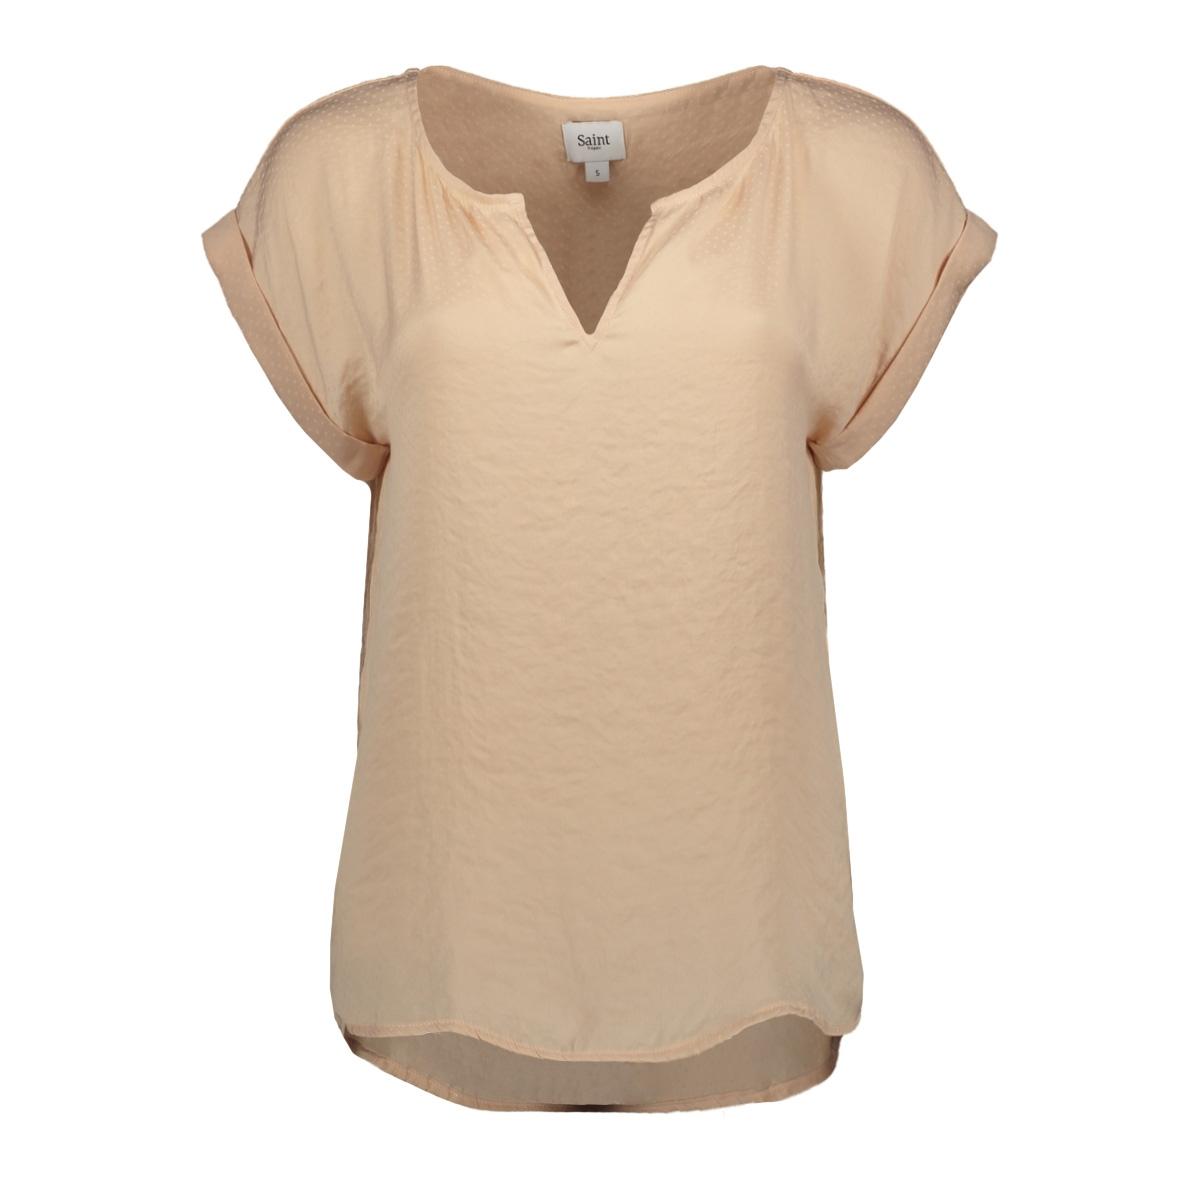 top with fabric dots p1326 saint tropez t-shirt 3212 rose